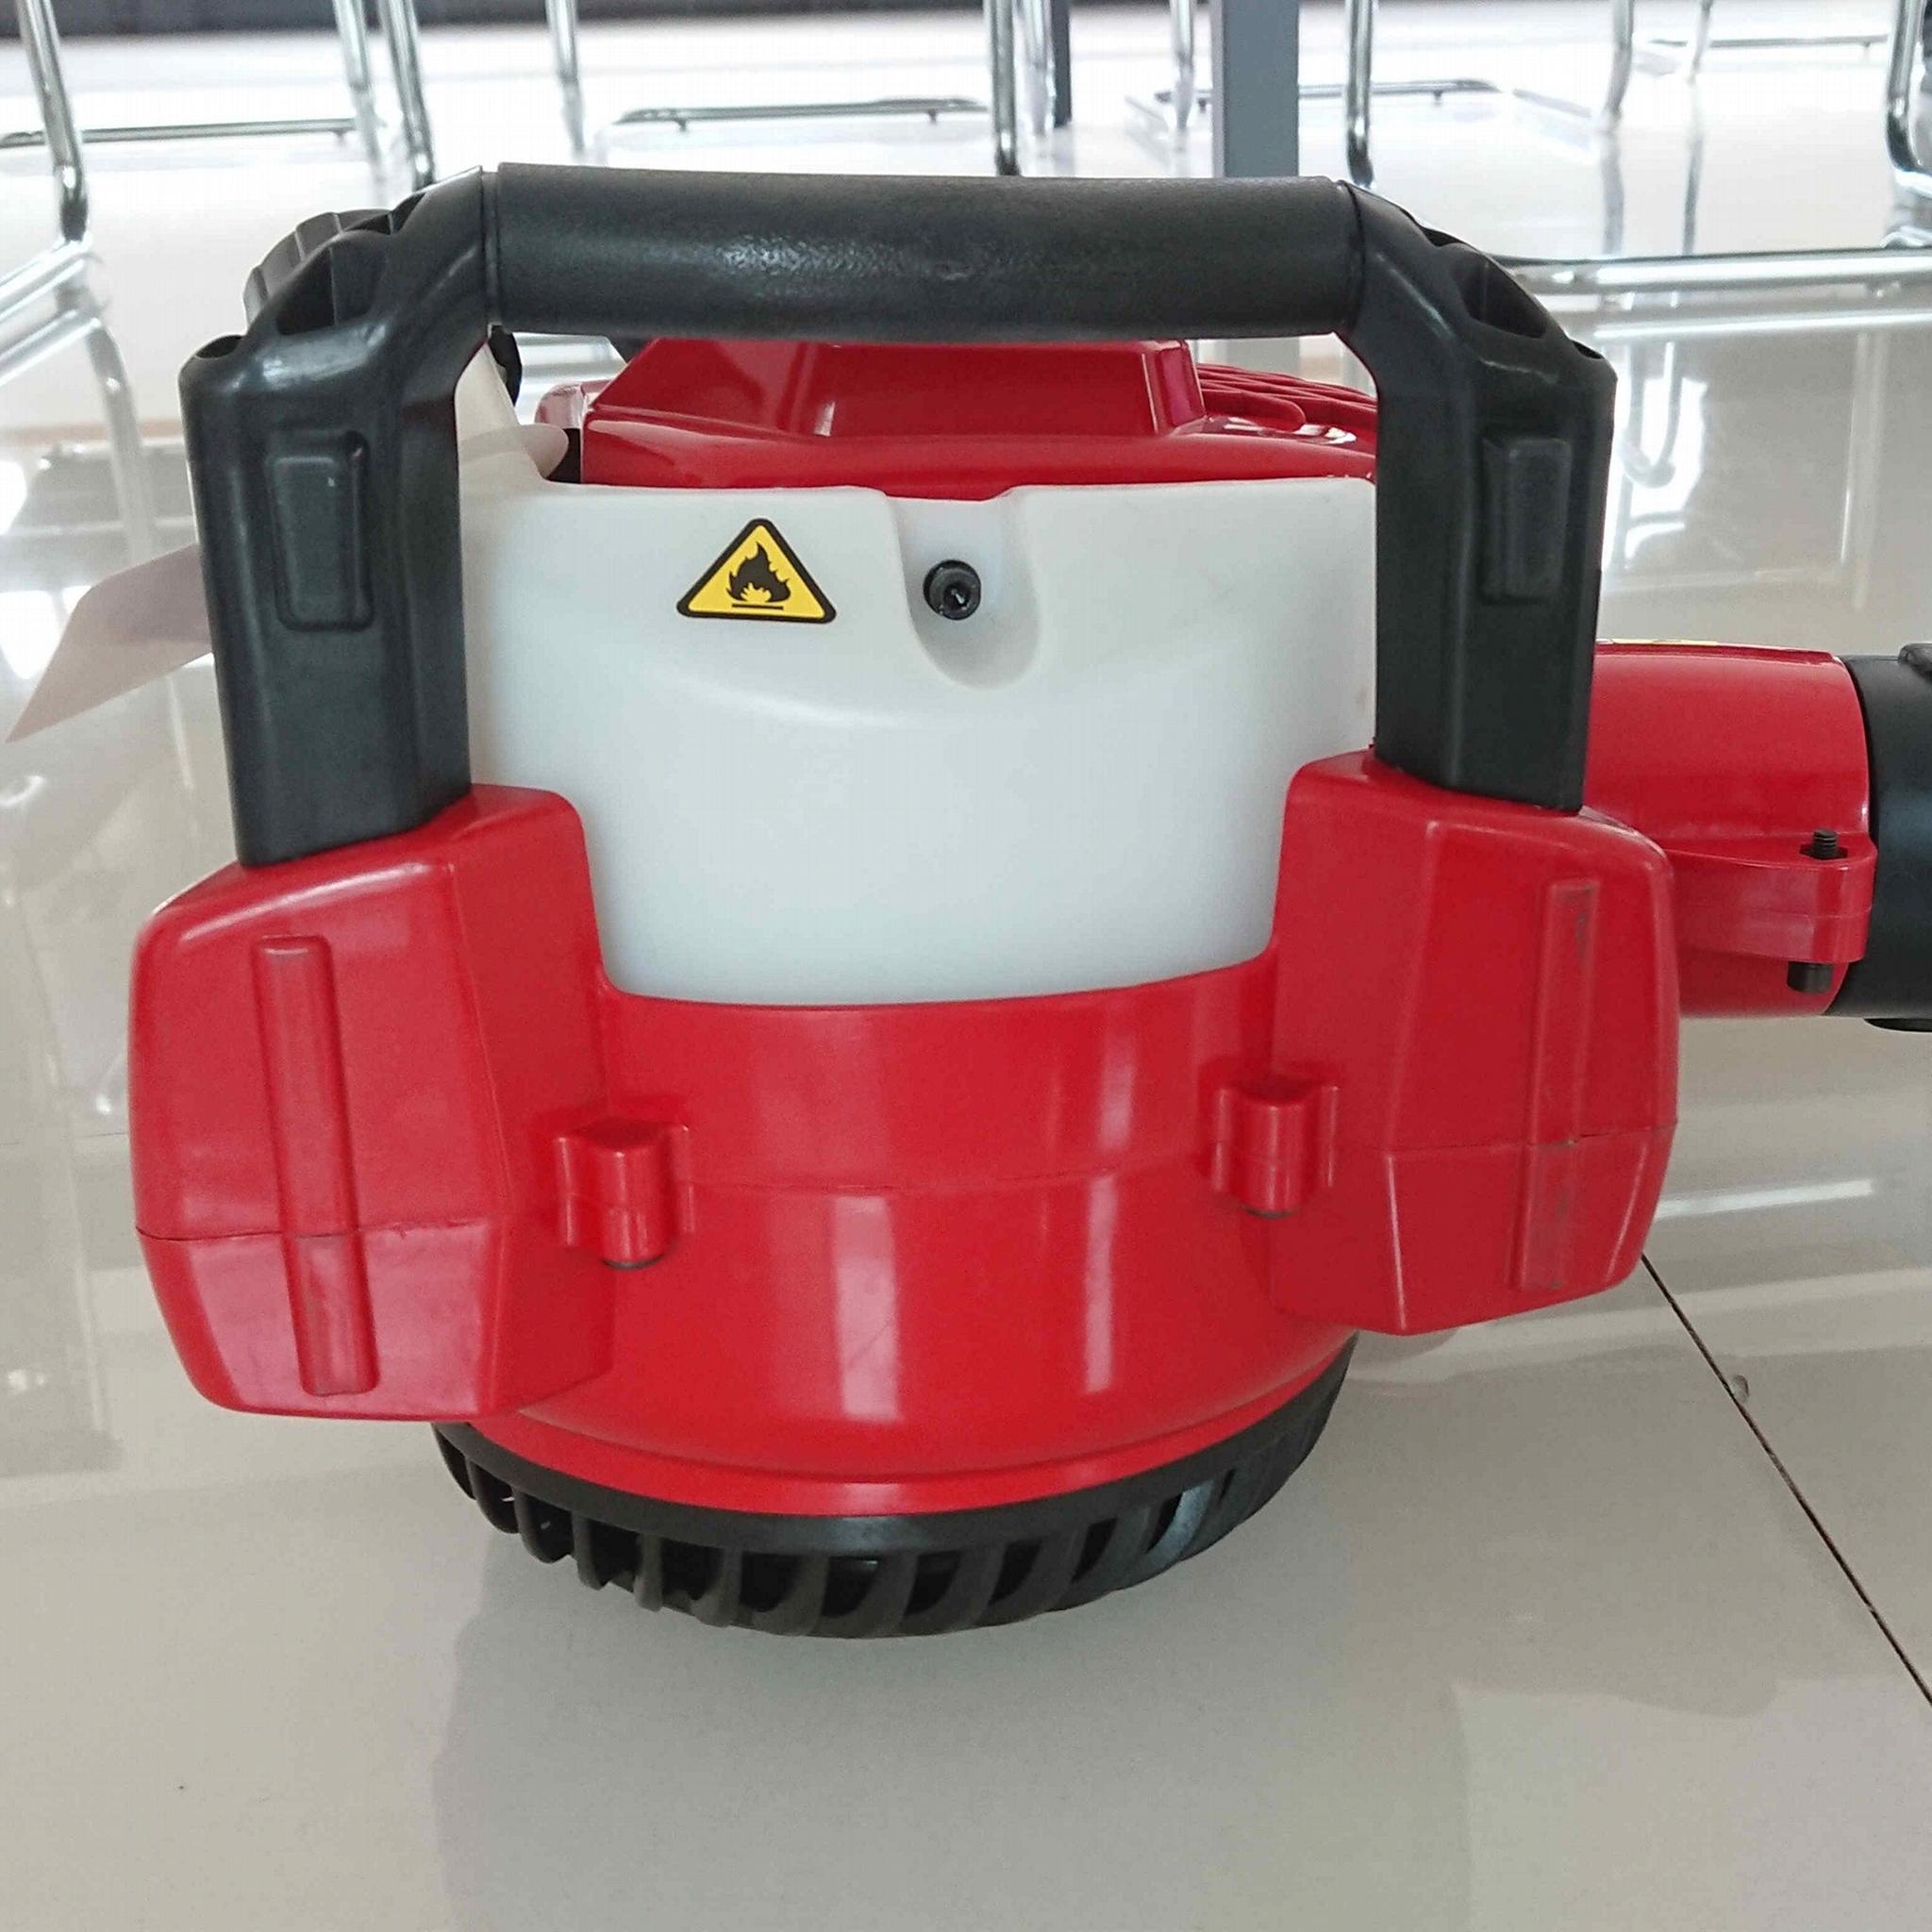 Hand-held 2-stroke engine blower with CE & Euro V emission standard 6